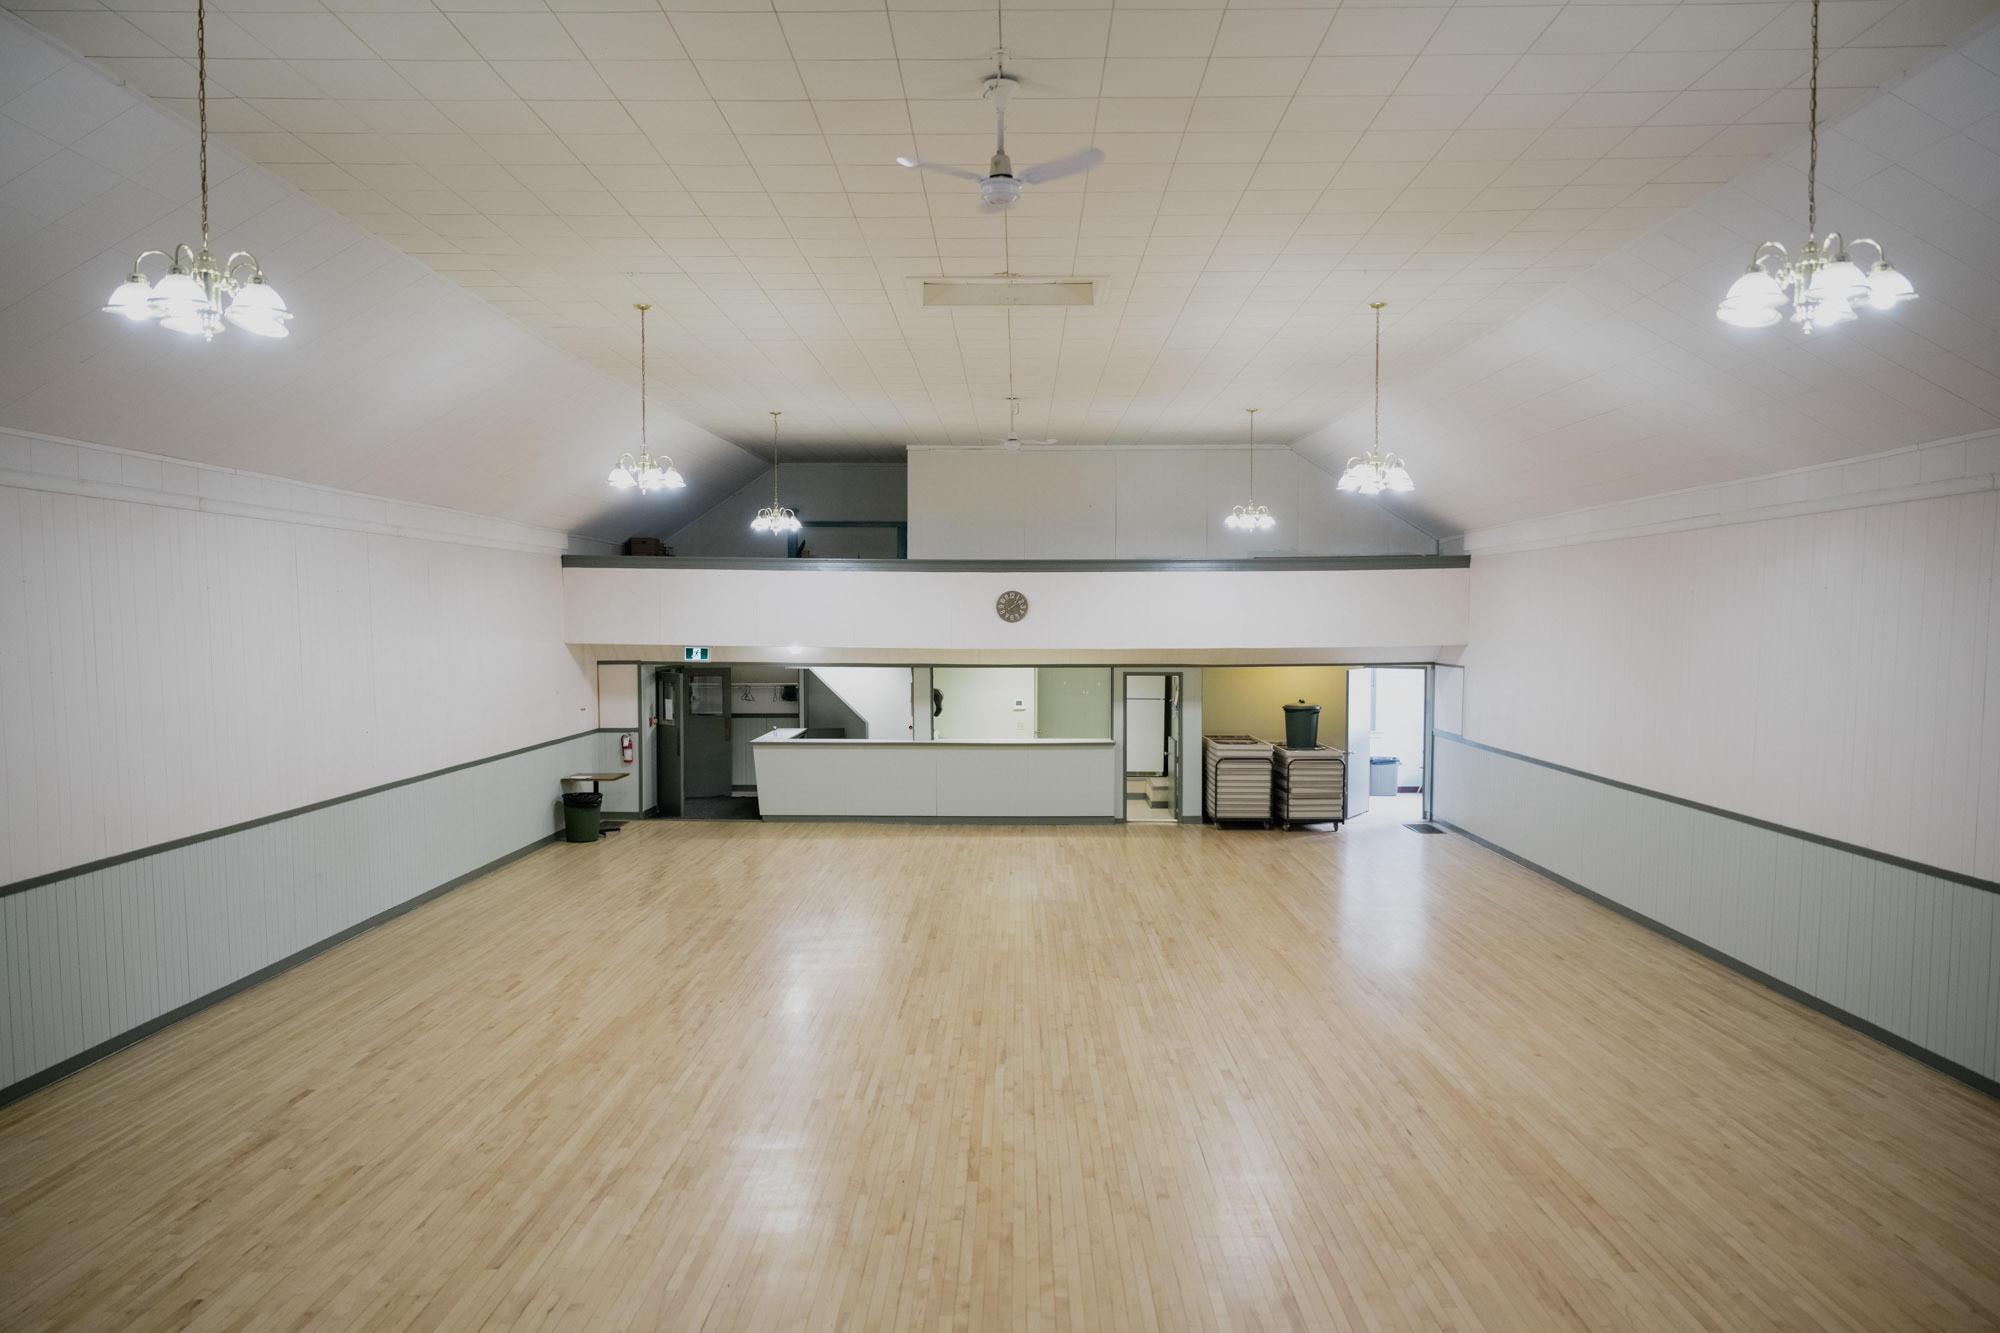 Private Main Floor - Half Day